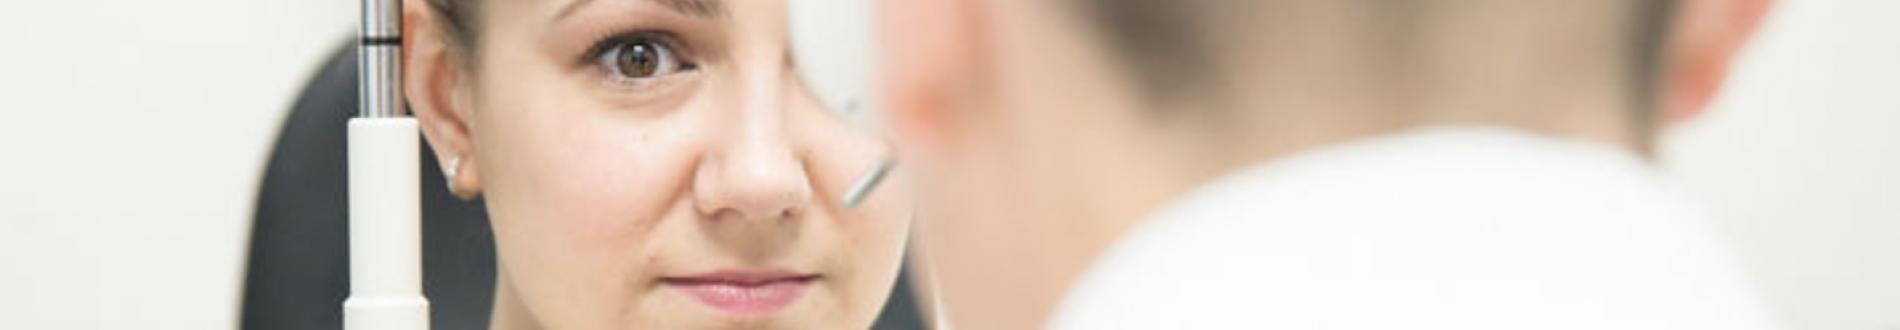 Woman getting eye exam with doctor